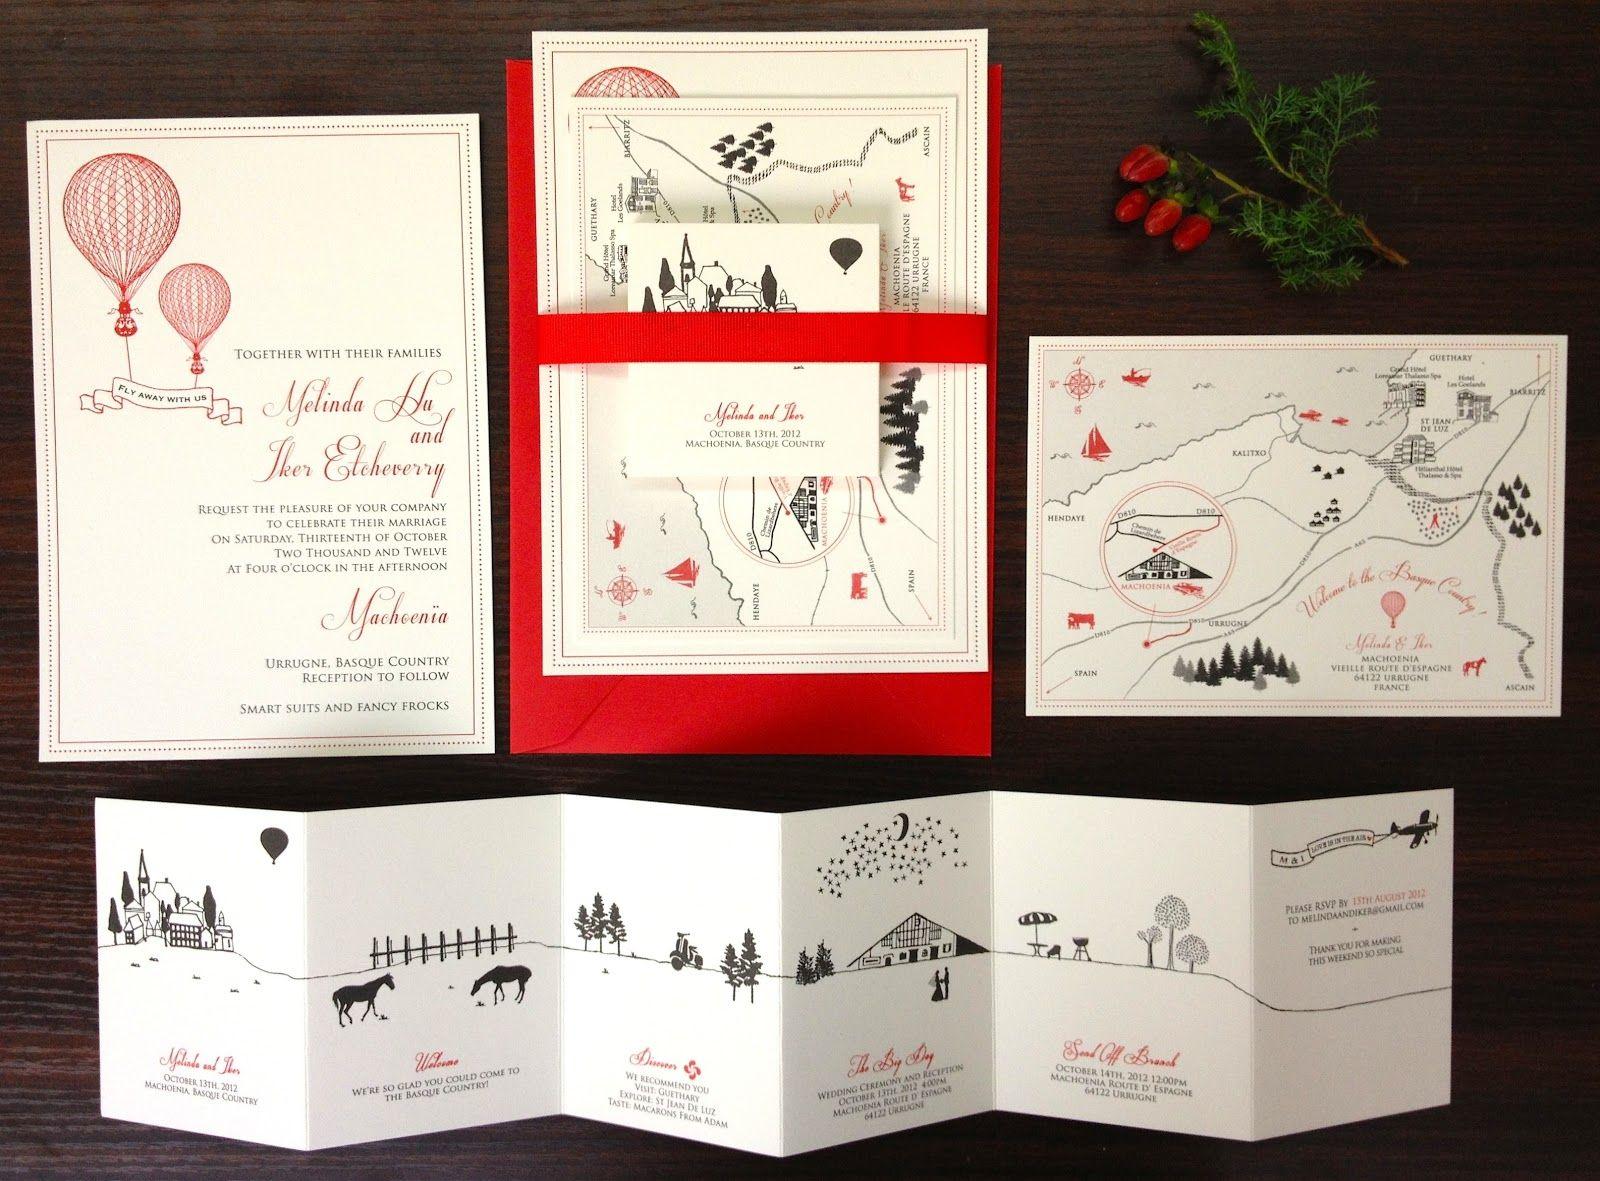 Http4bpspot 5nmih0zob eujjrclivneiaaaaaaaacti kalo make art bespoke wedding invitation designs rustic basque country bespoke wedding invitation hong kong stopboris Images